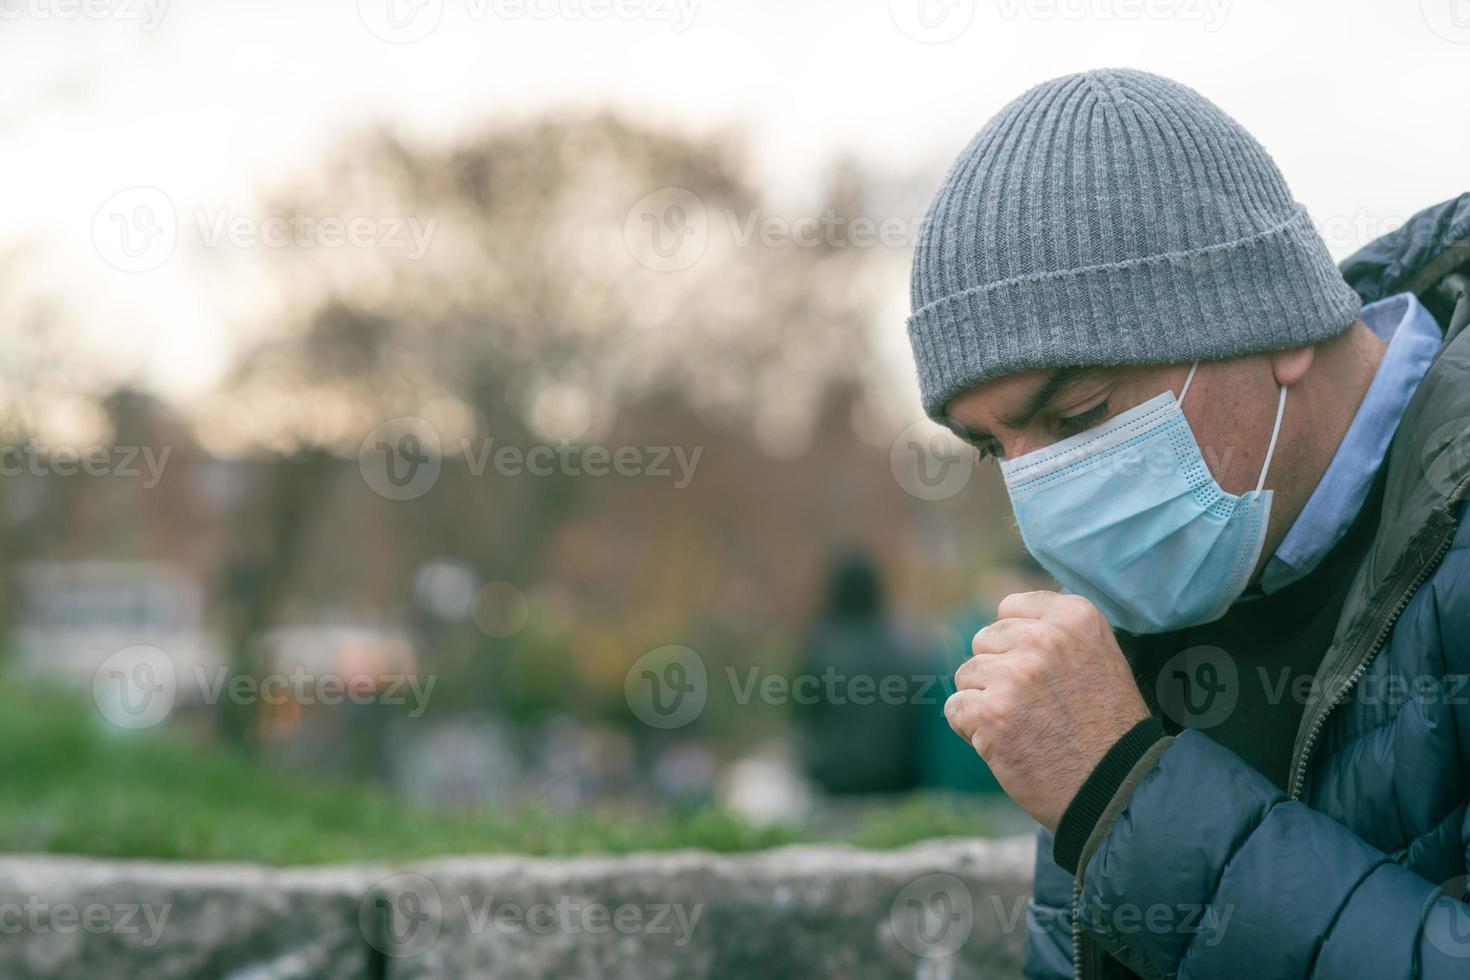 Sneezing using a protective mask photo